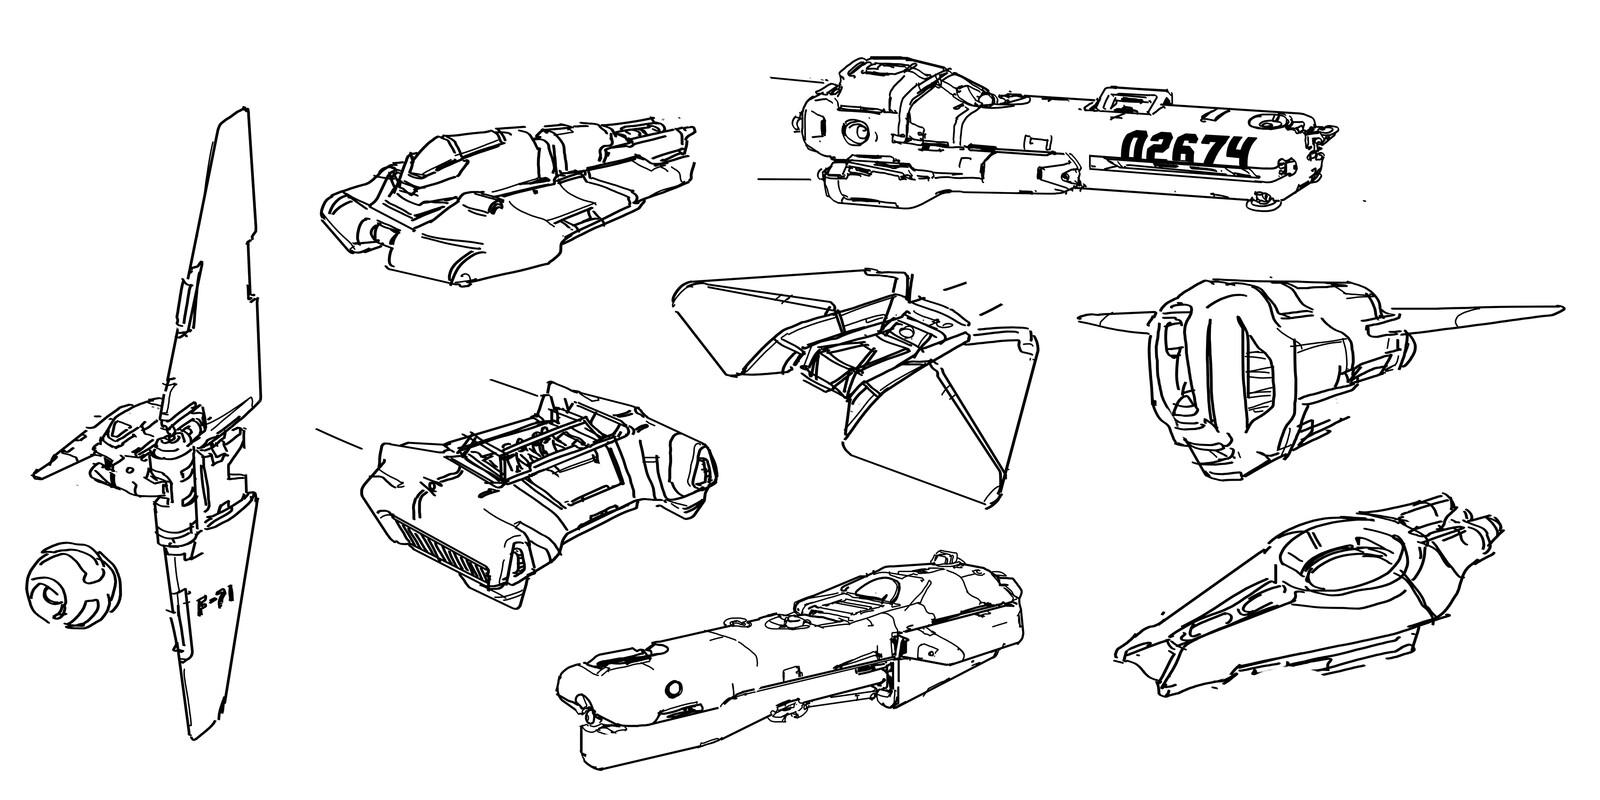 some random ships